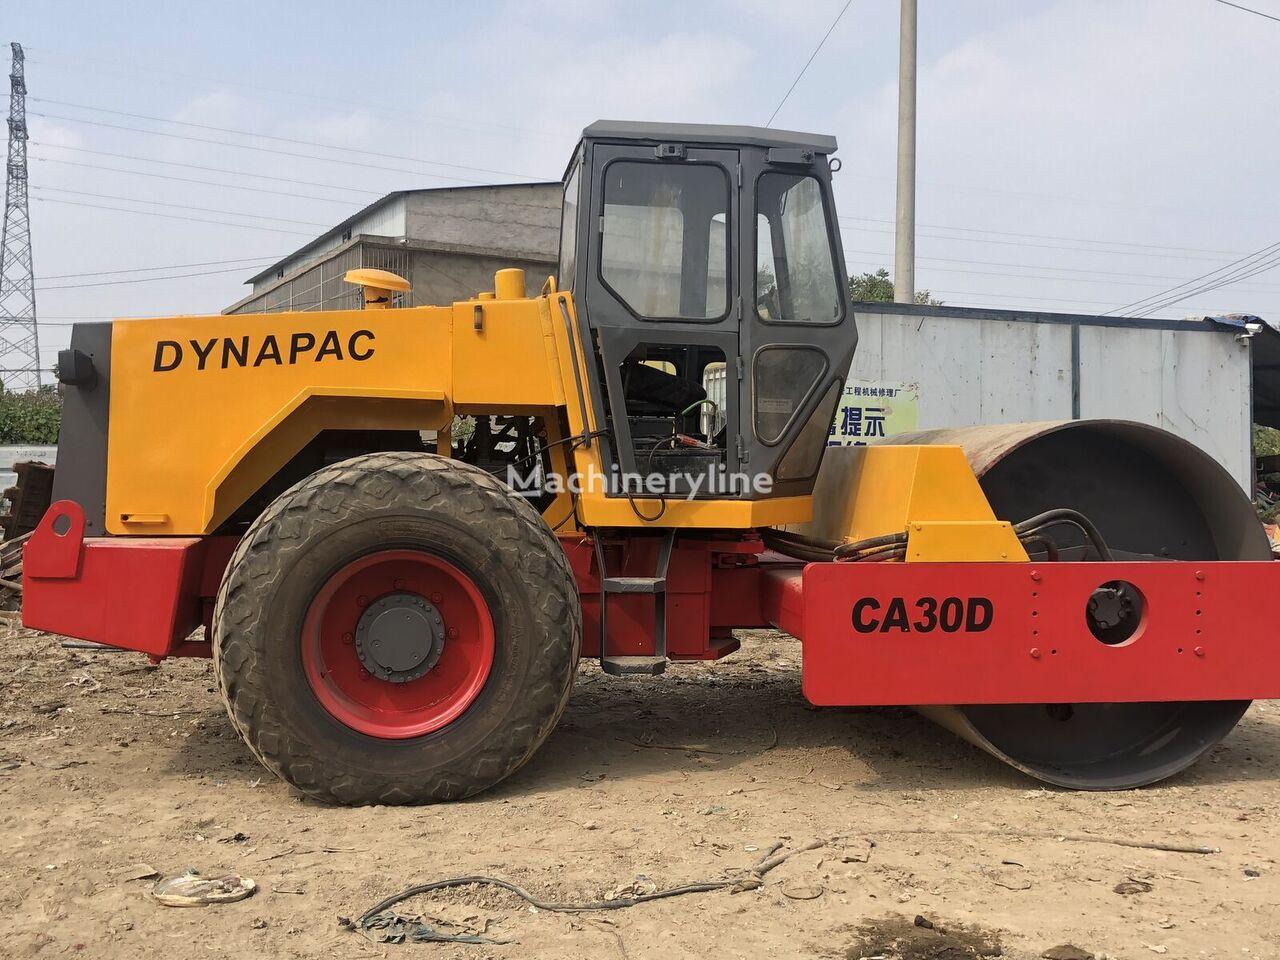 DYNAPAC CA30D single drum compactor